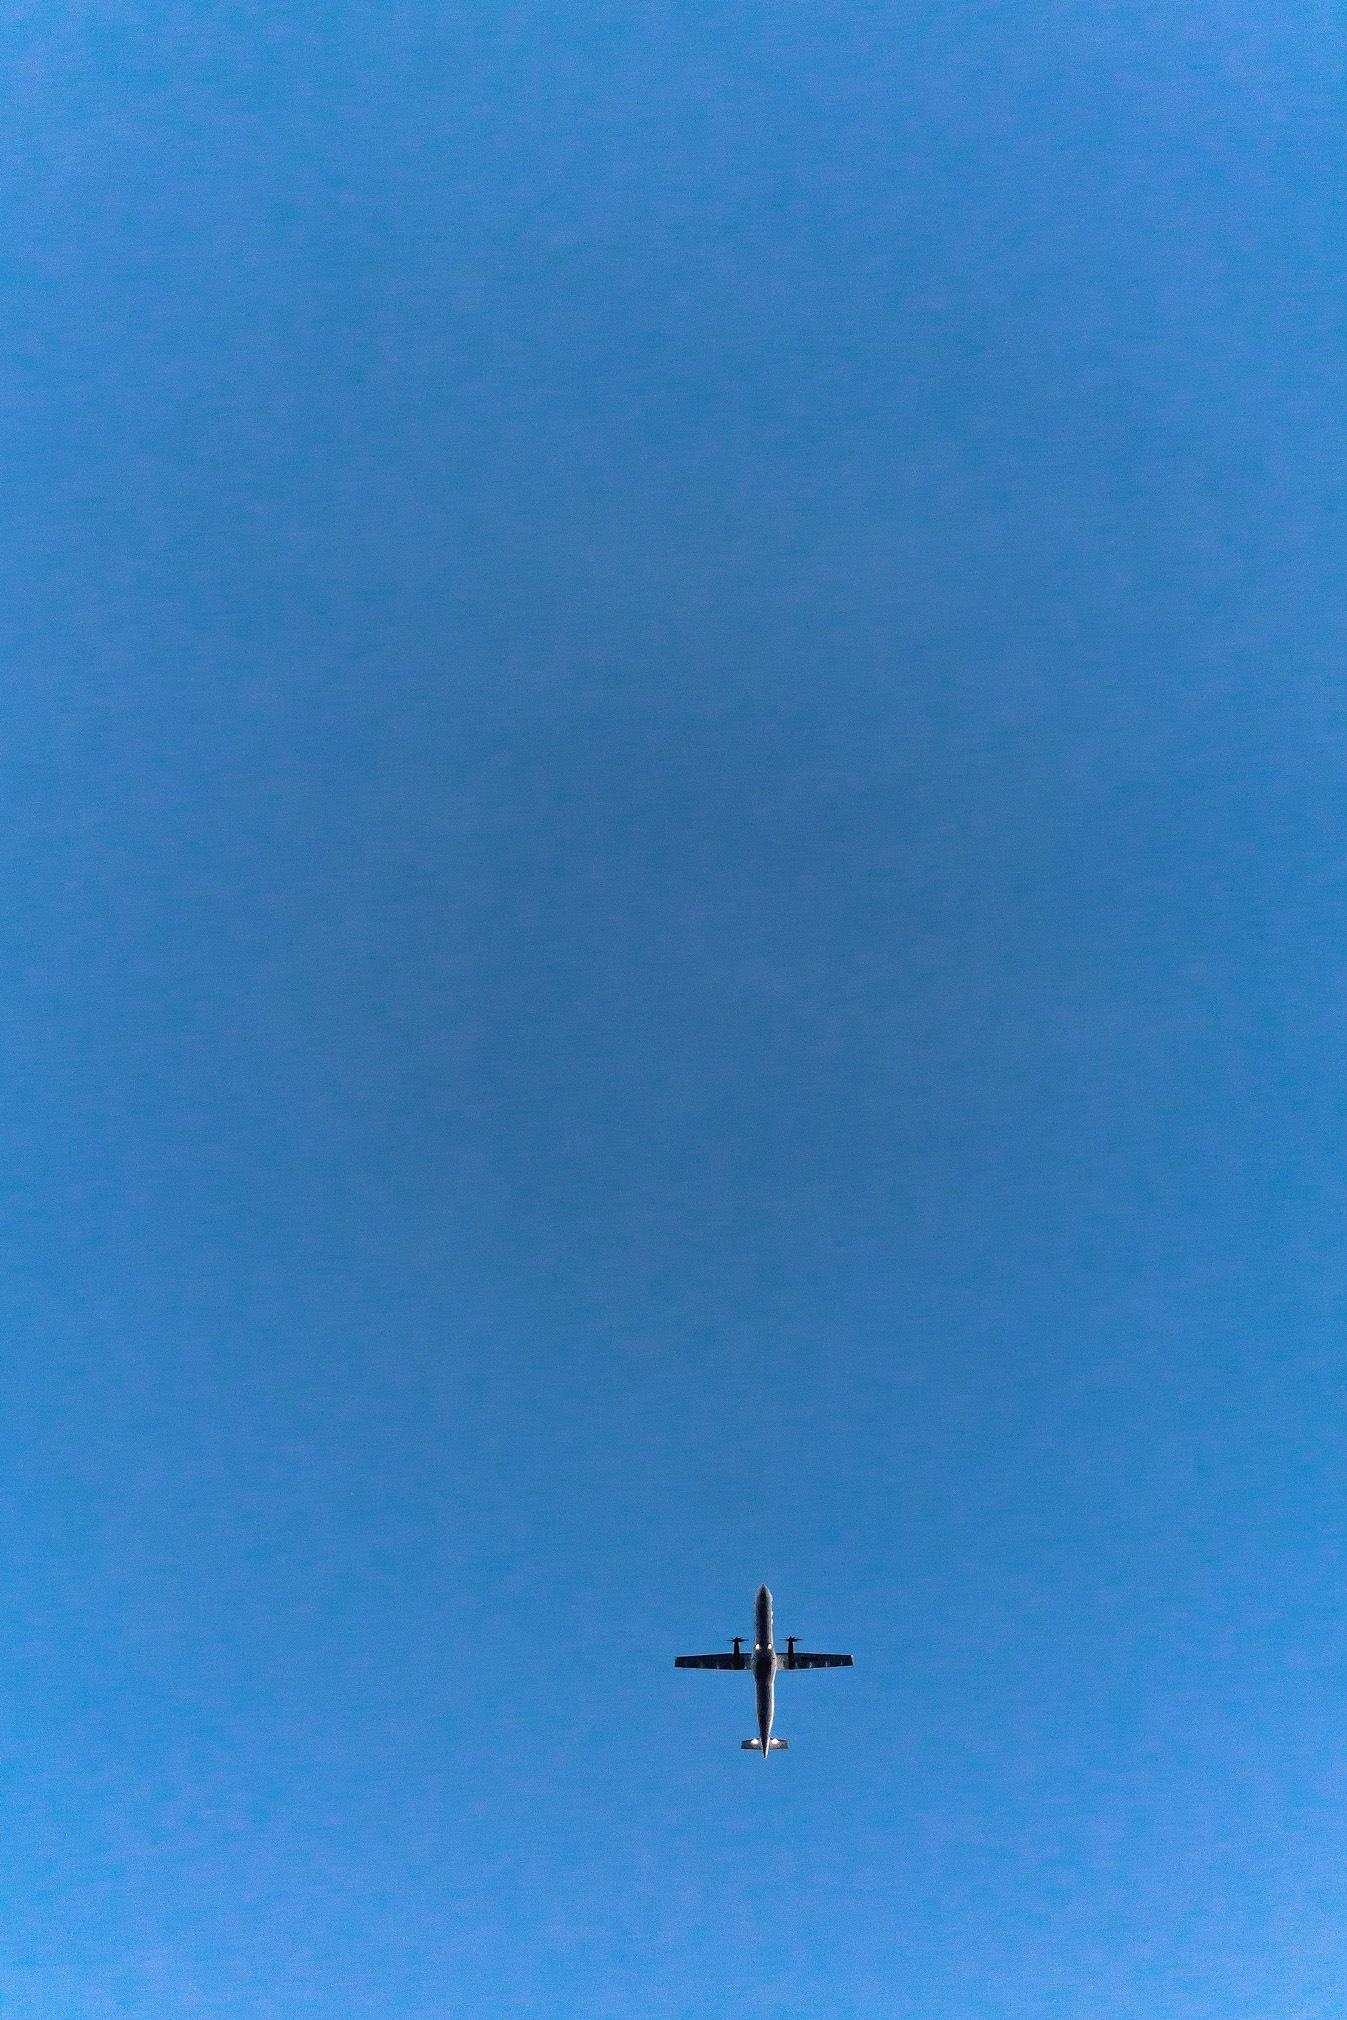 plane by Gerardo Torres